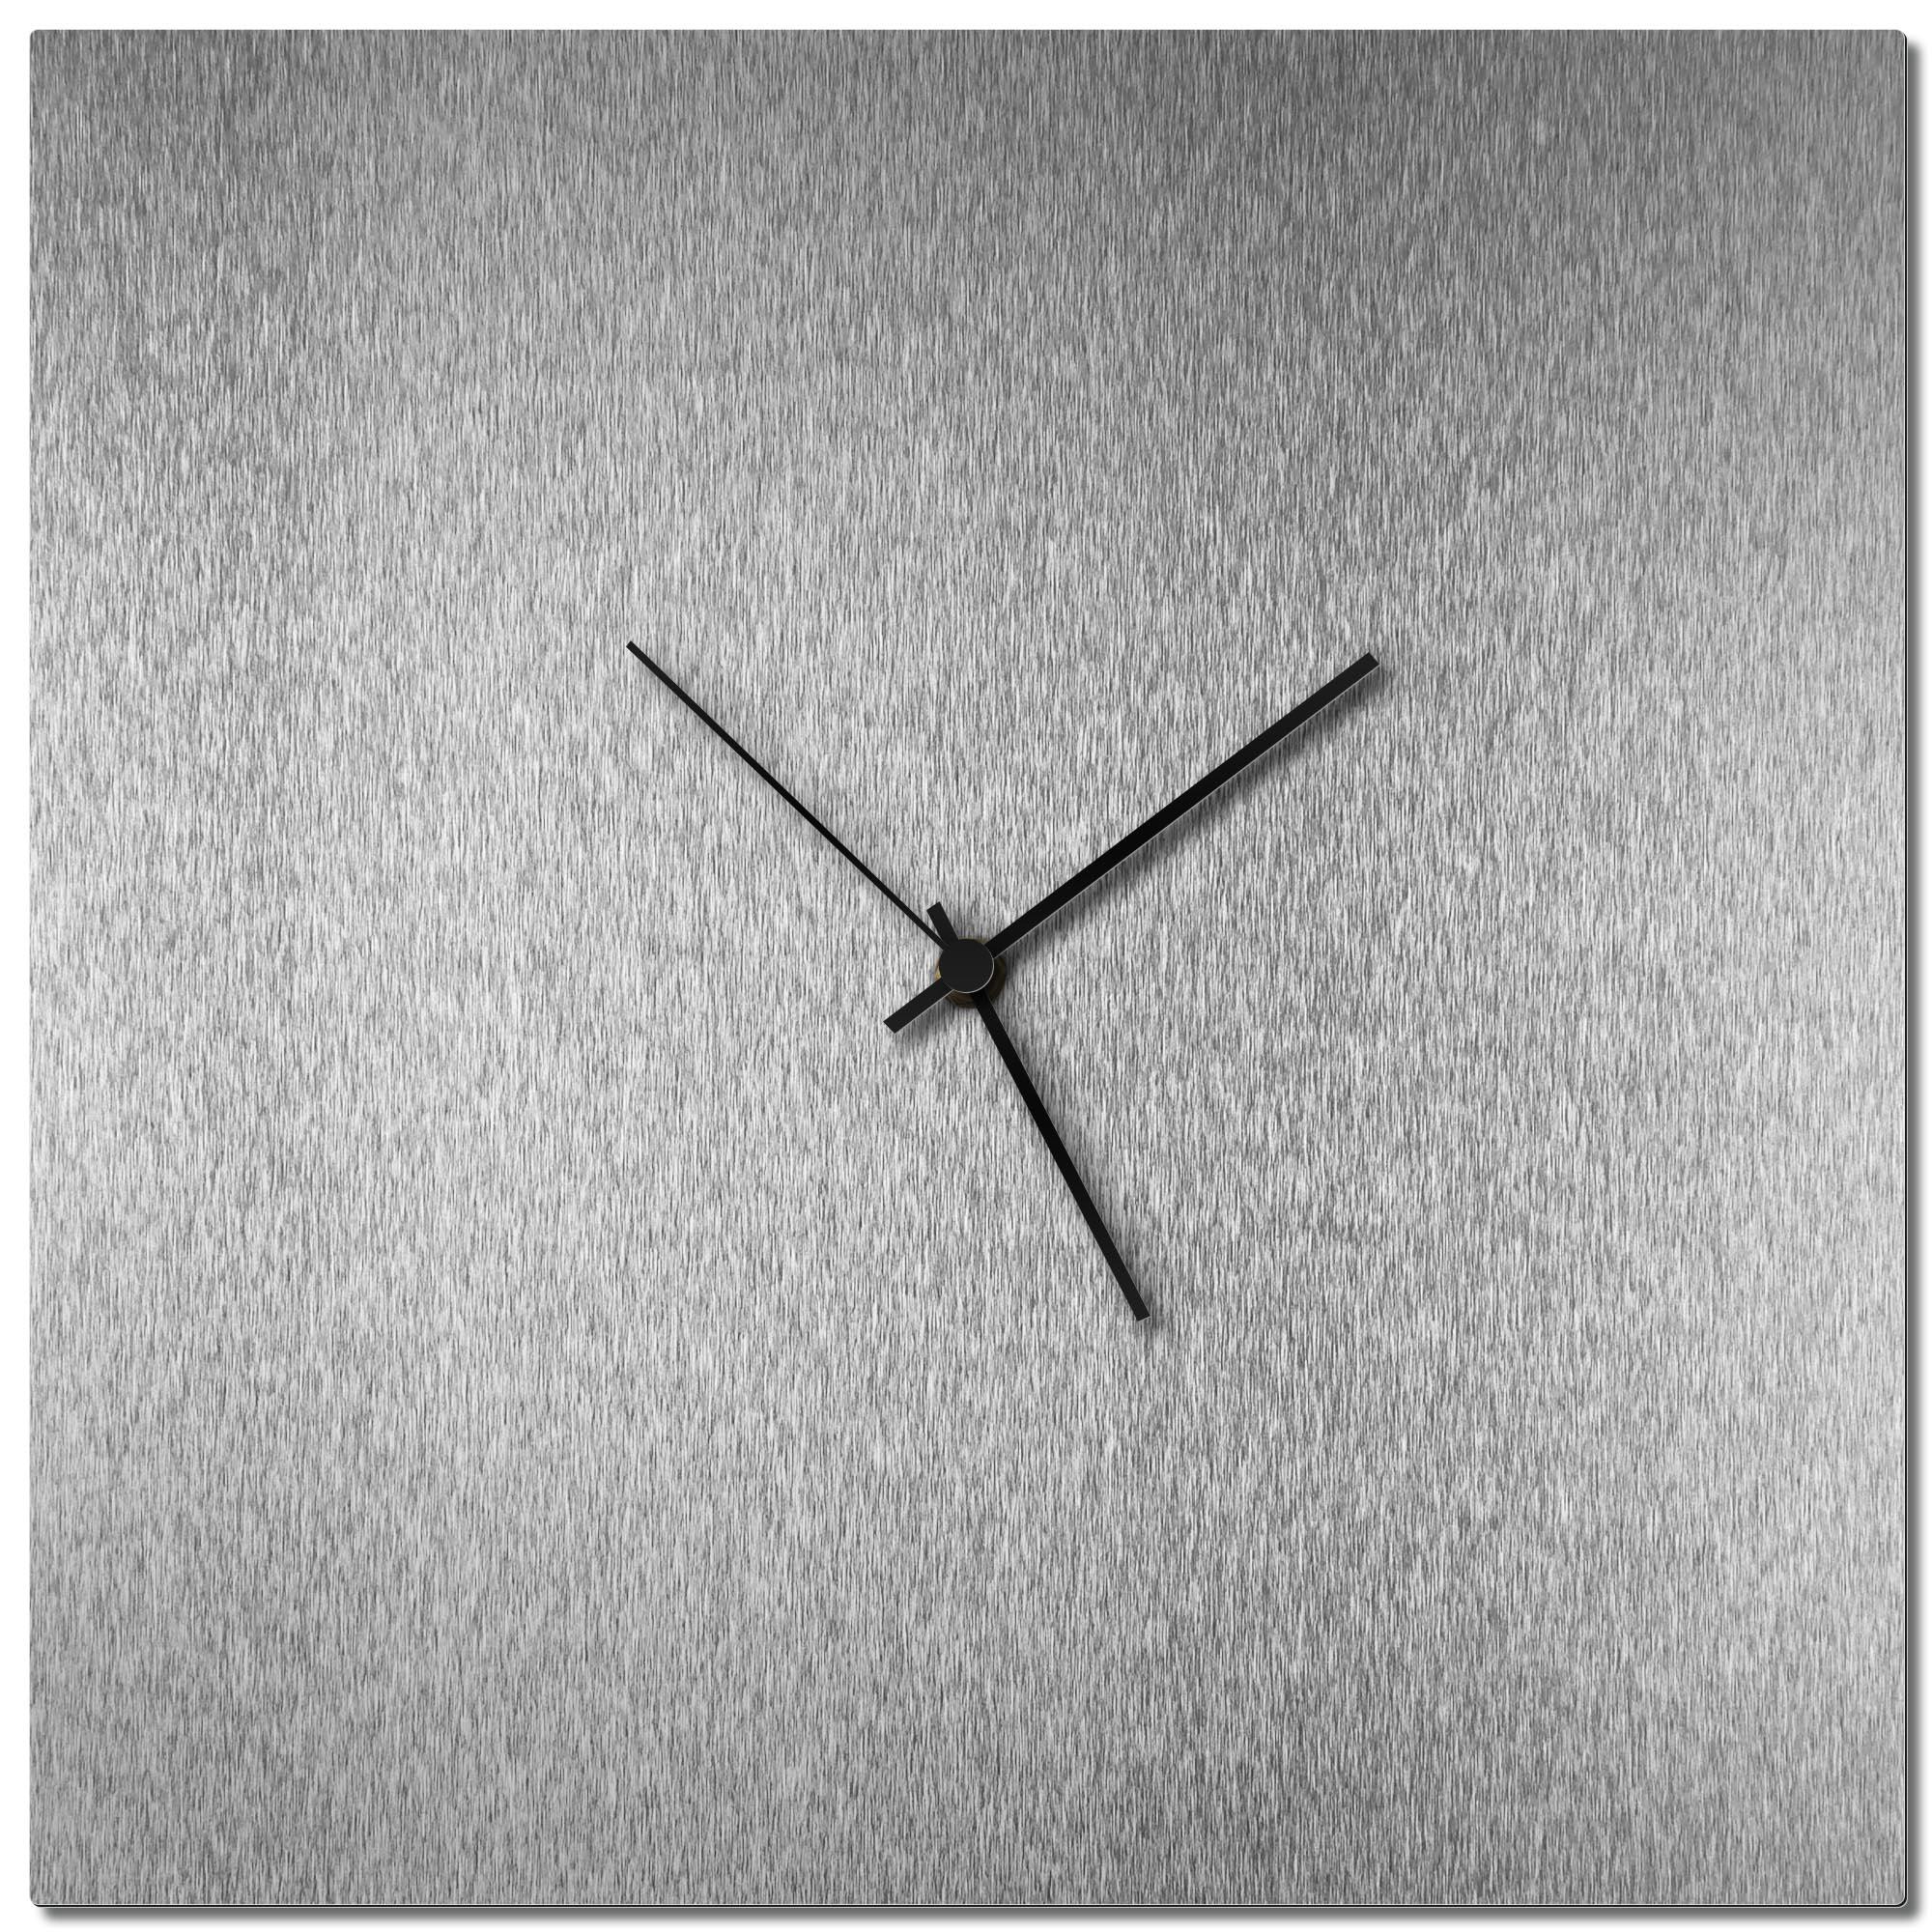 Adam Schwoeppe 'Silversmith Square Clock Black' Midcentury Modern Style Wall Clock